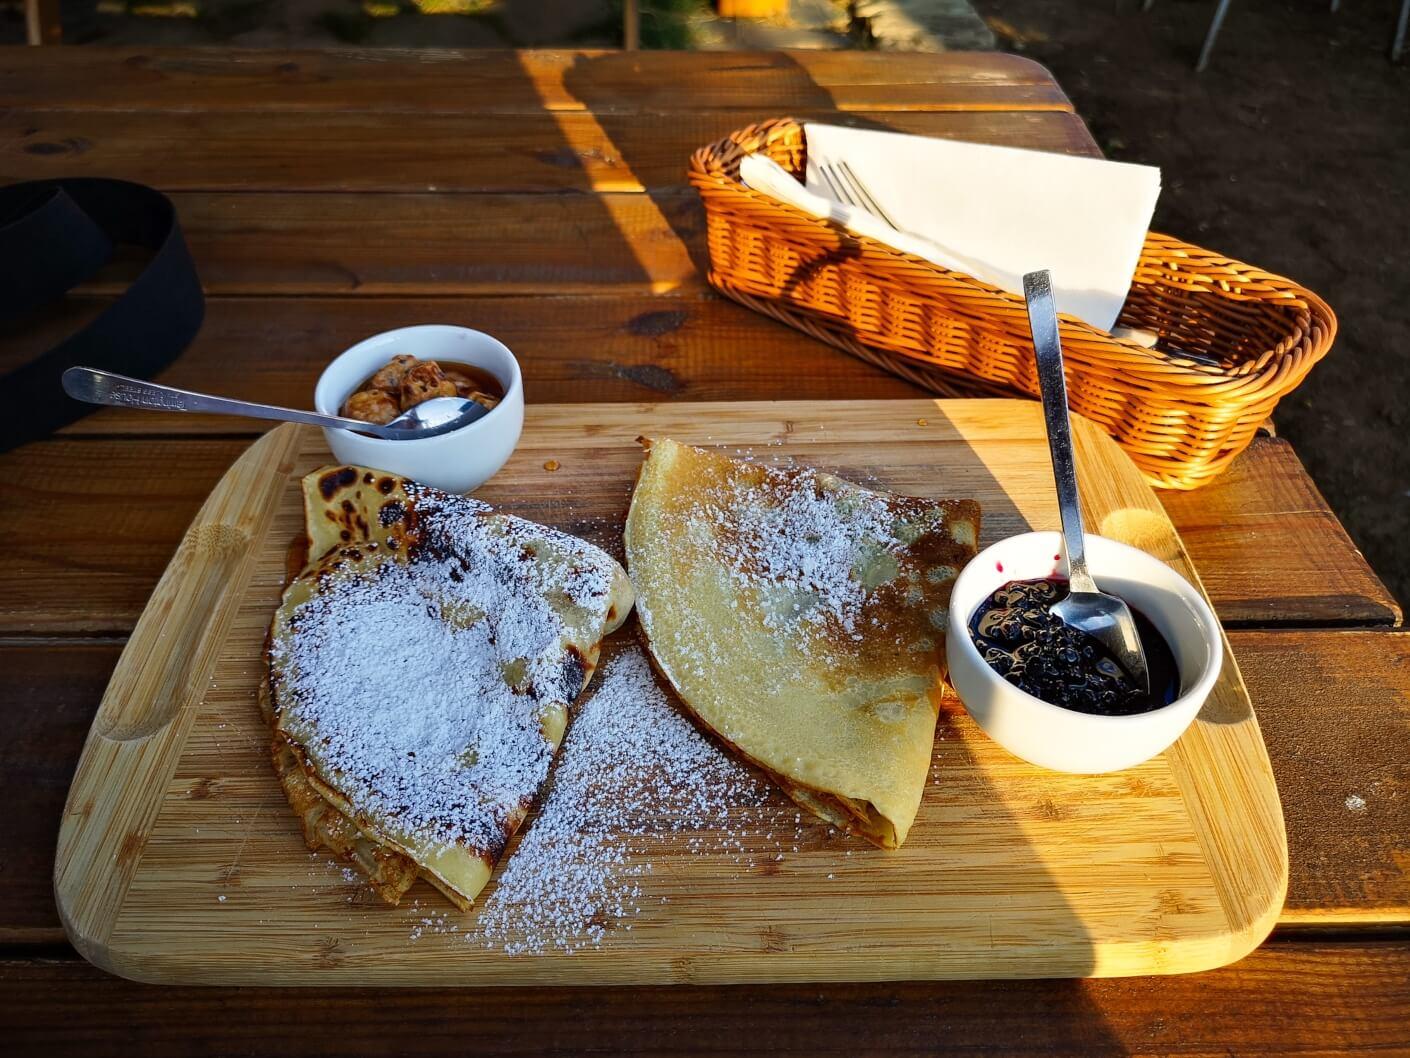 Pancackes with elderflower jam and nuts jam